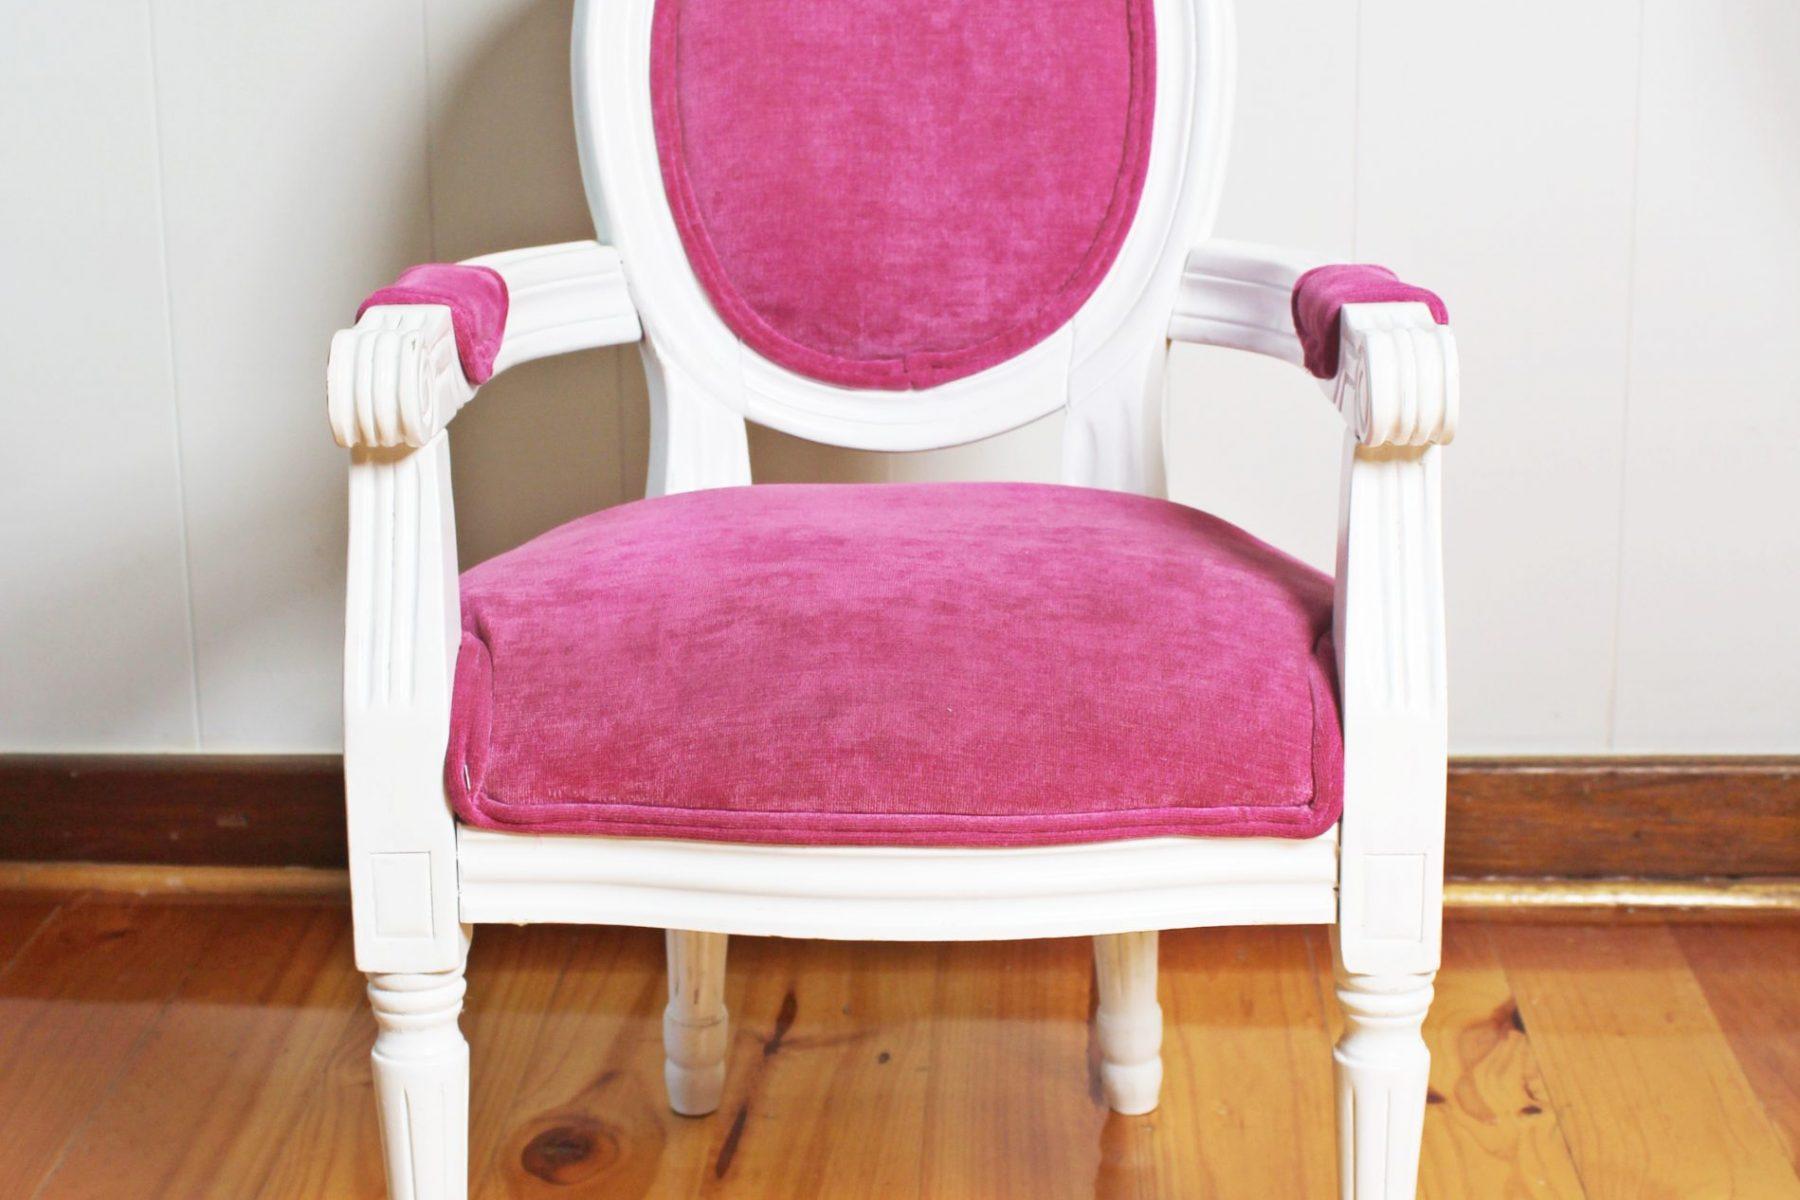 pinkchair2